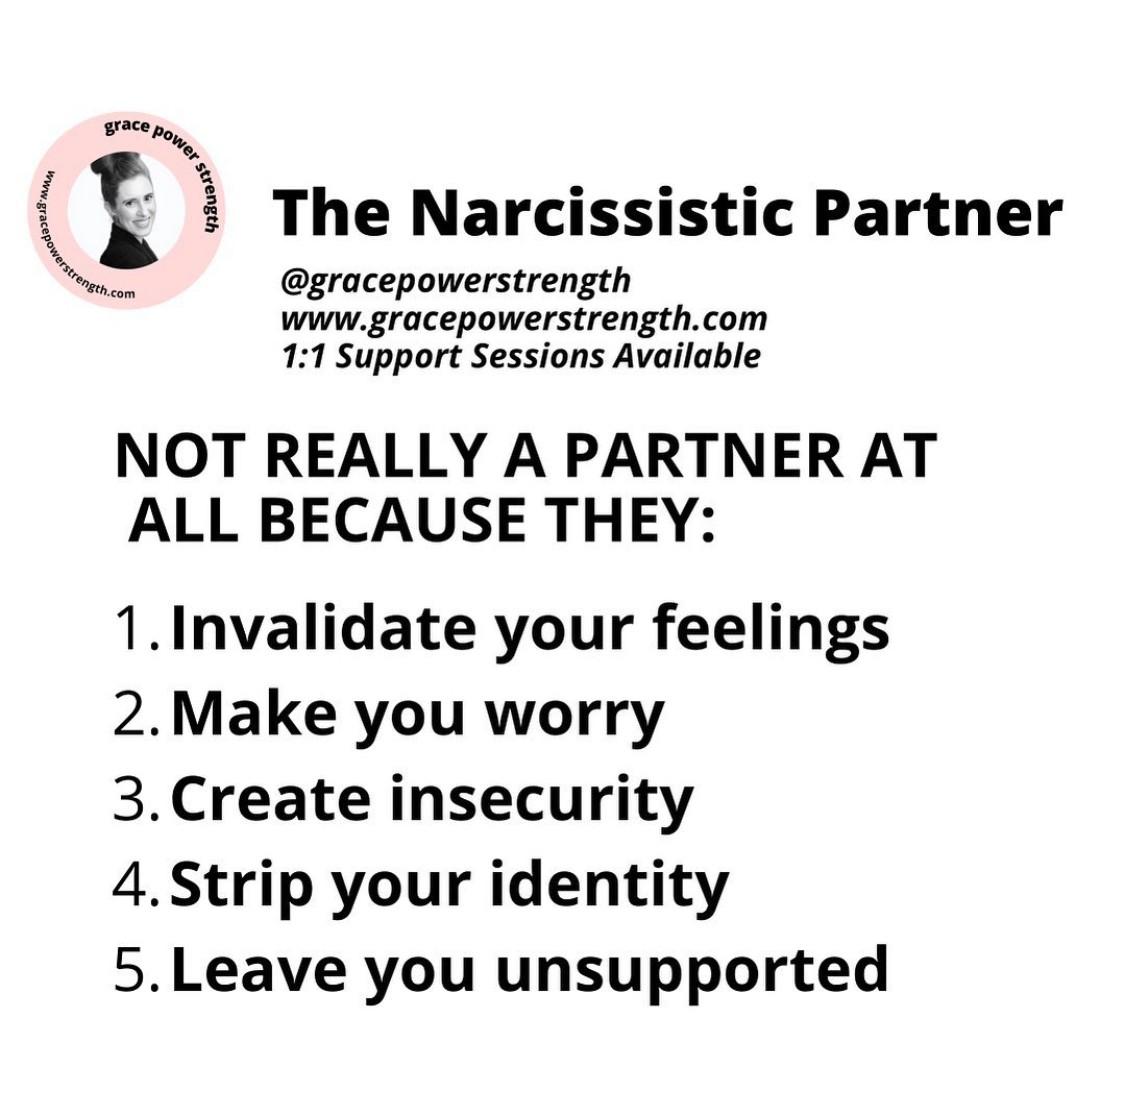 As a partner...